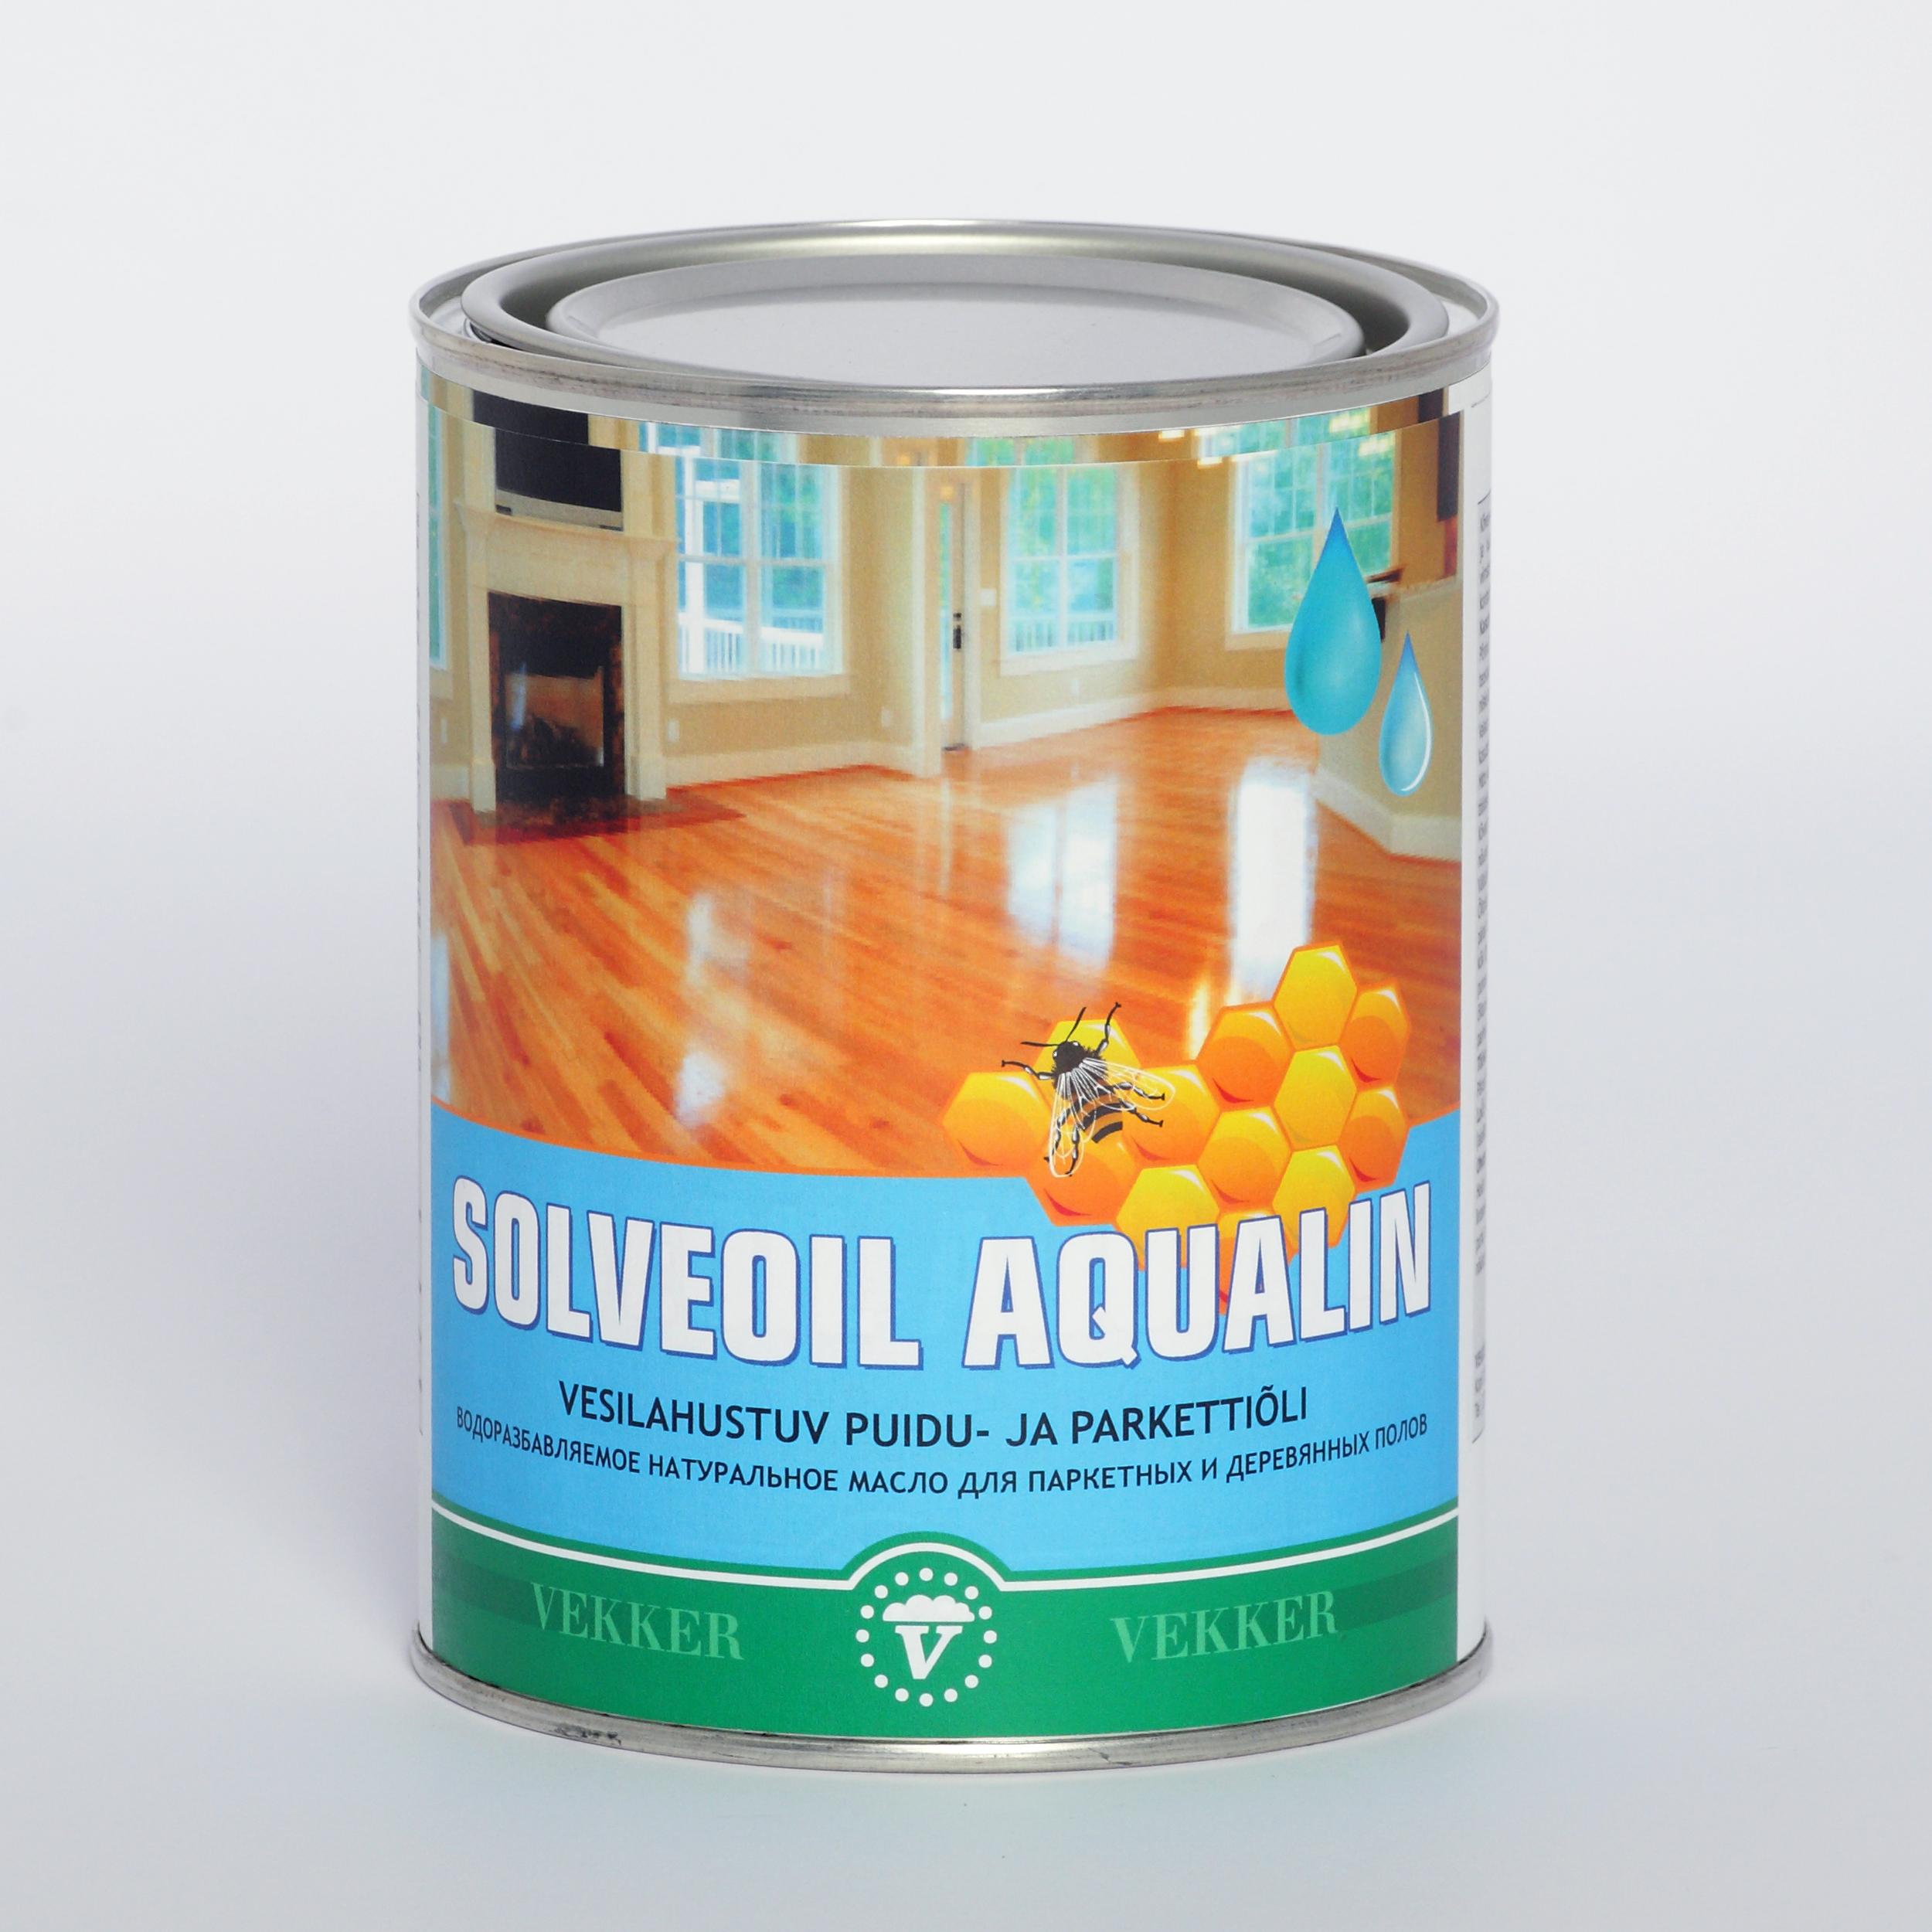 Solveoil Aqualin